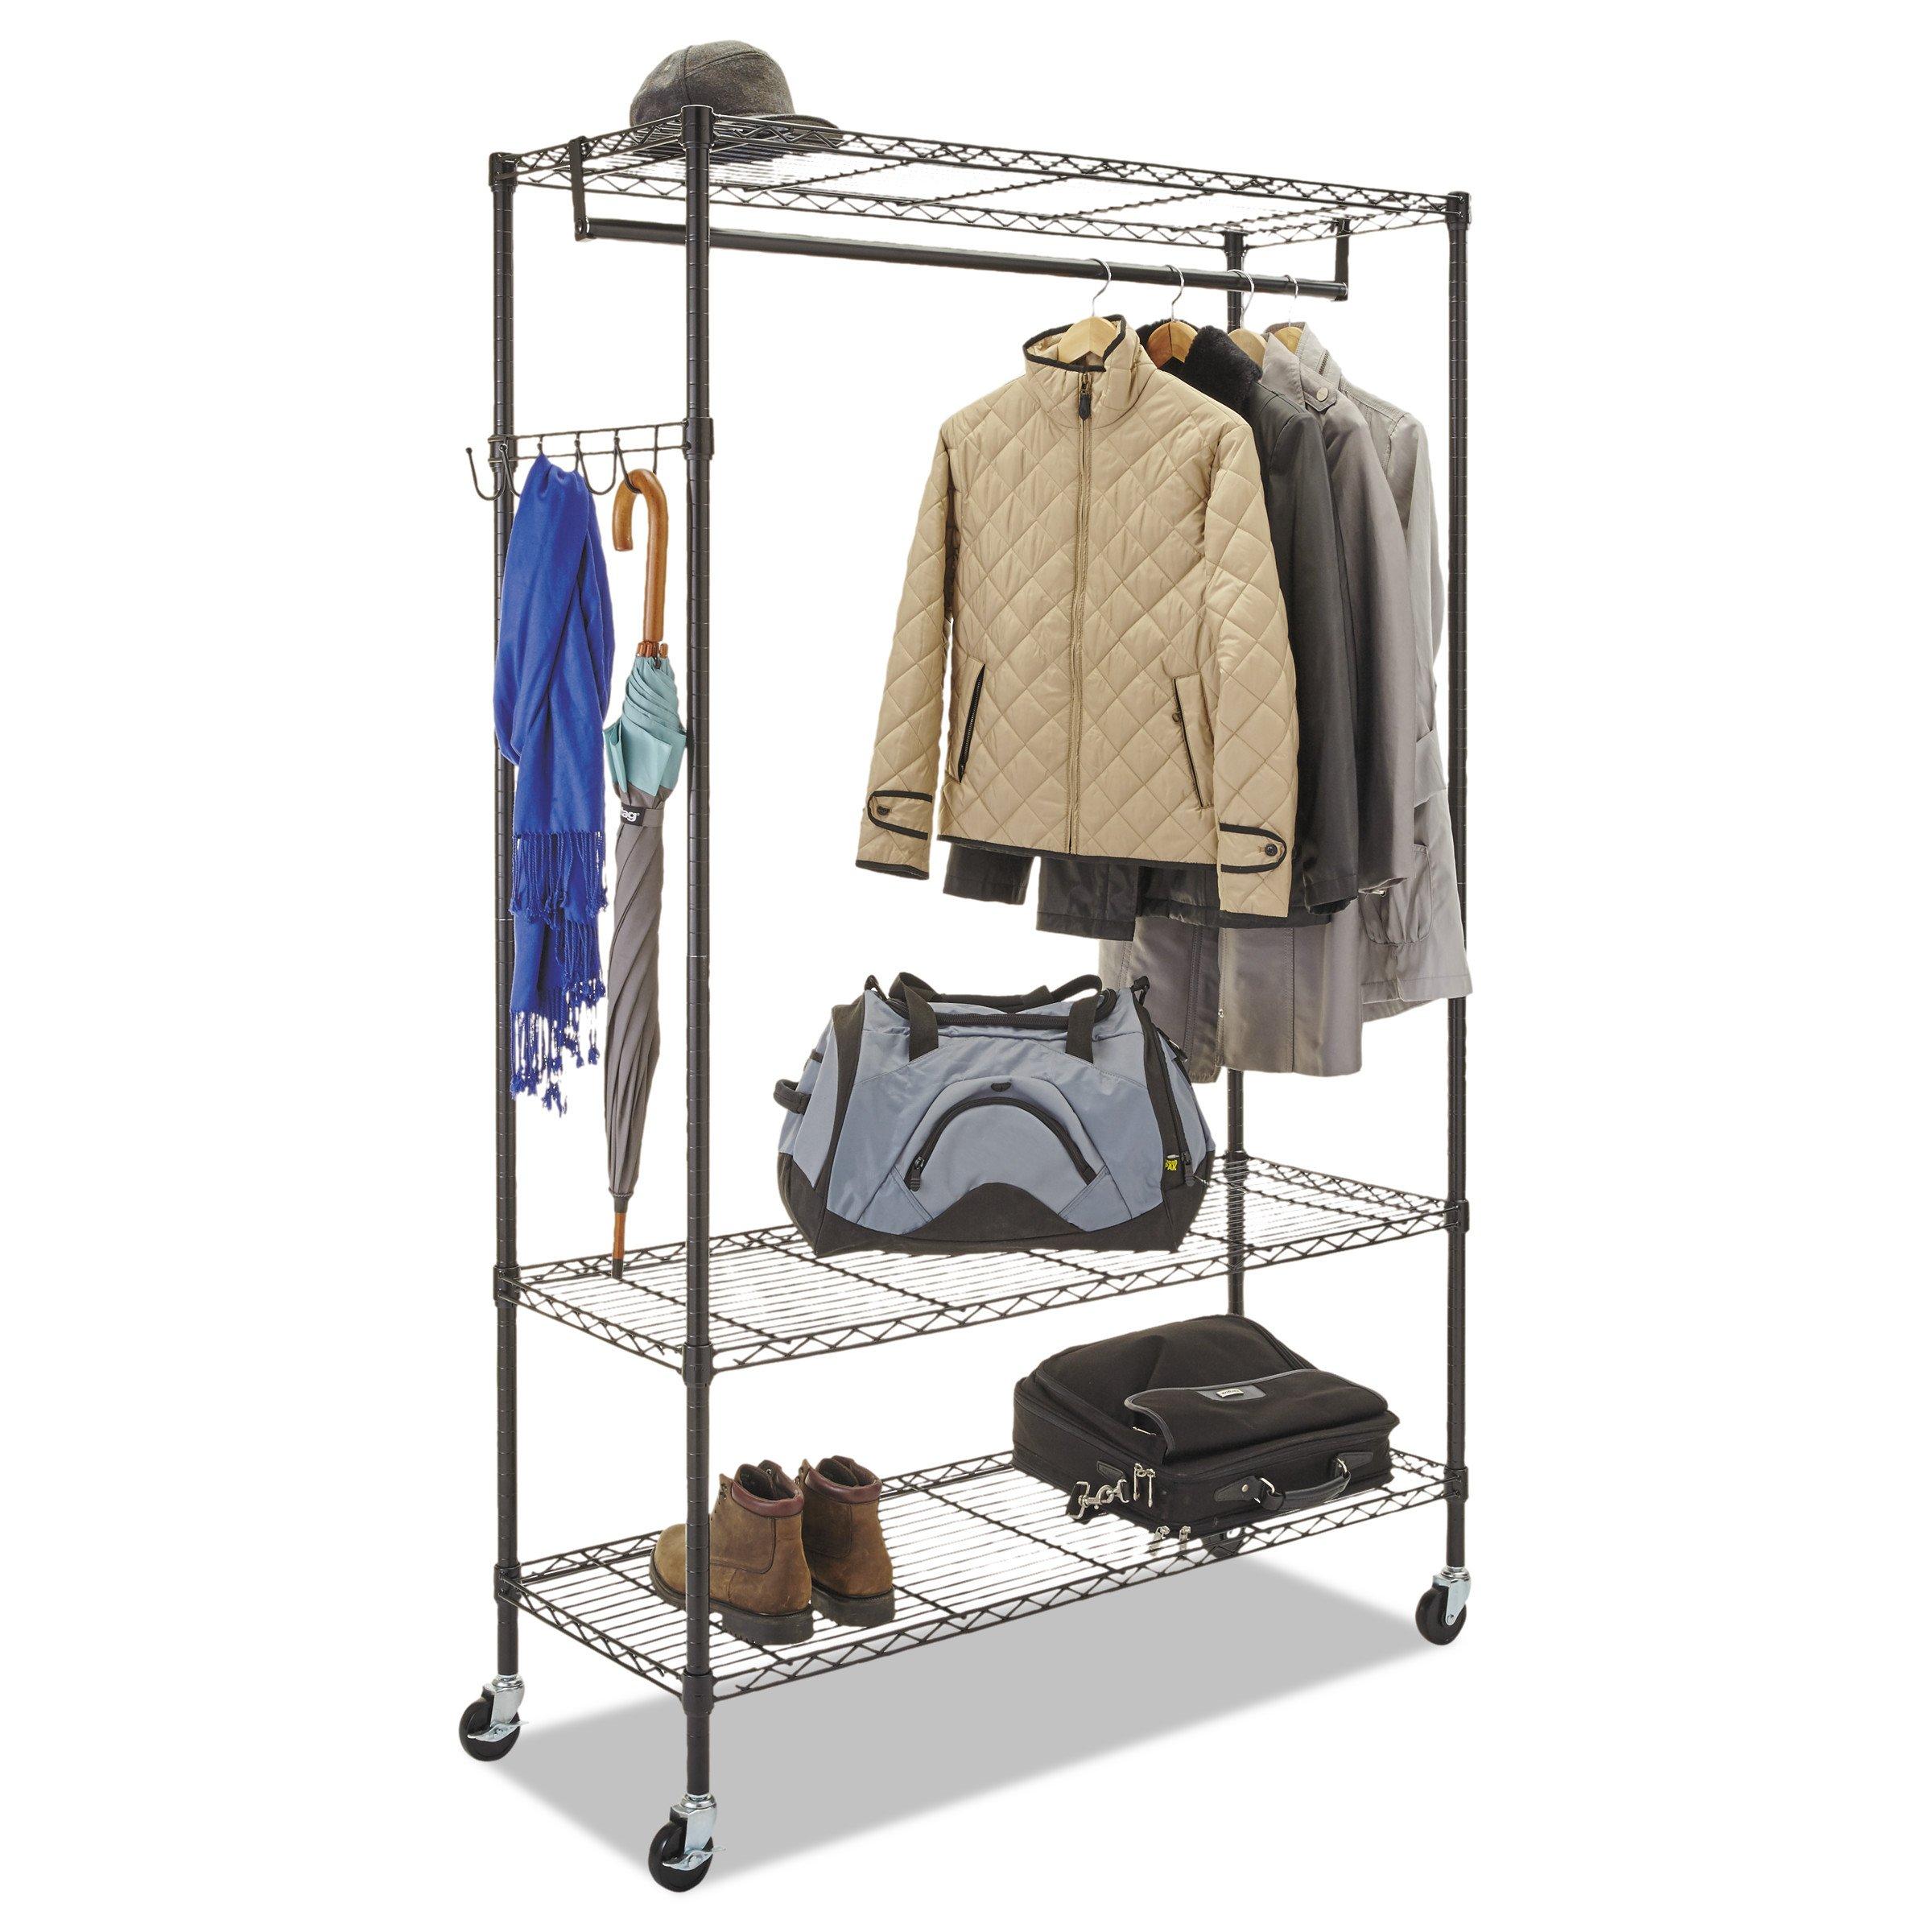 Alera Wire Shelving Garment Rack (Black) by Alera